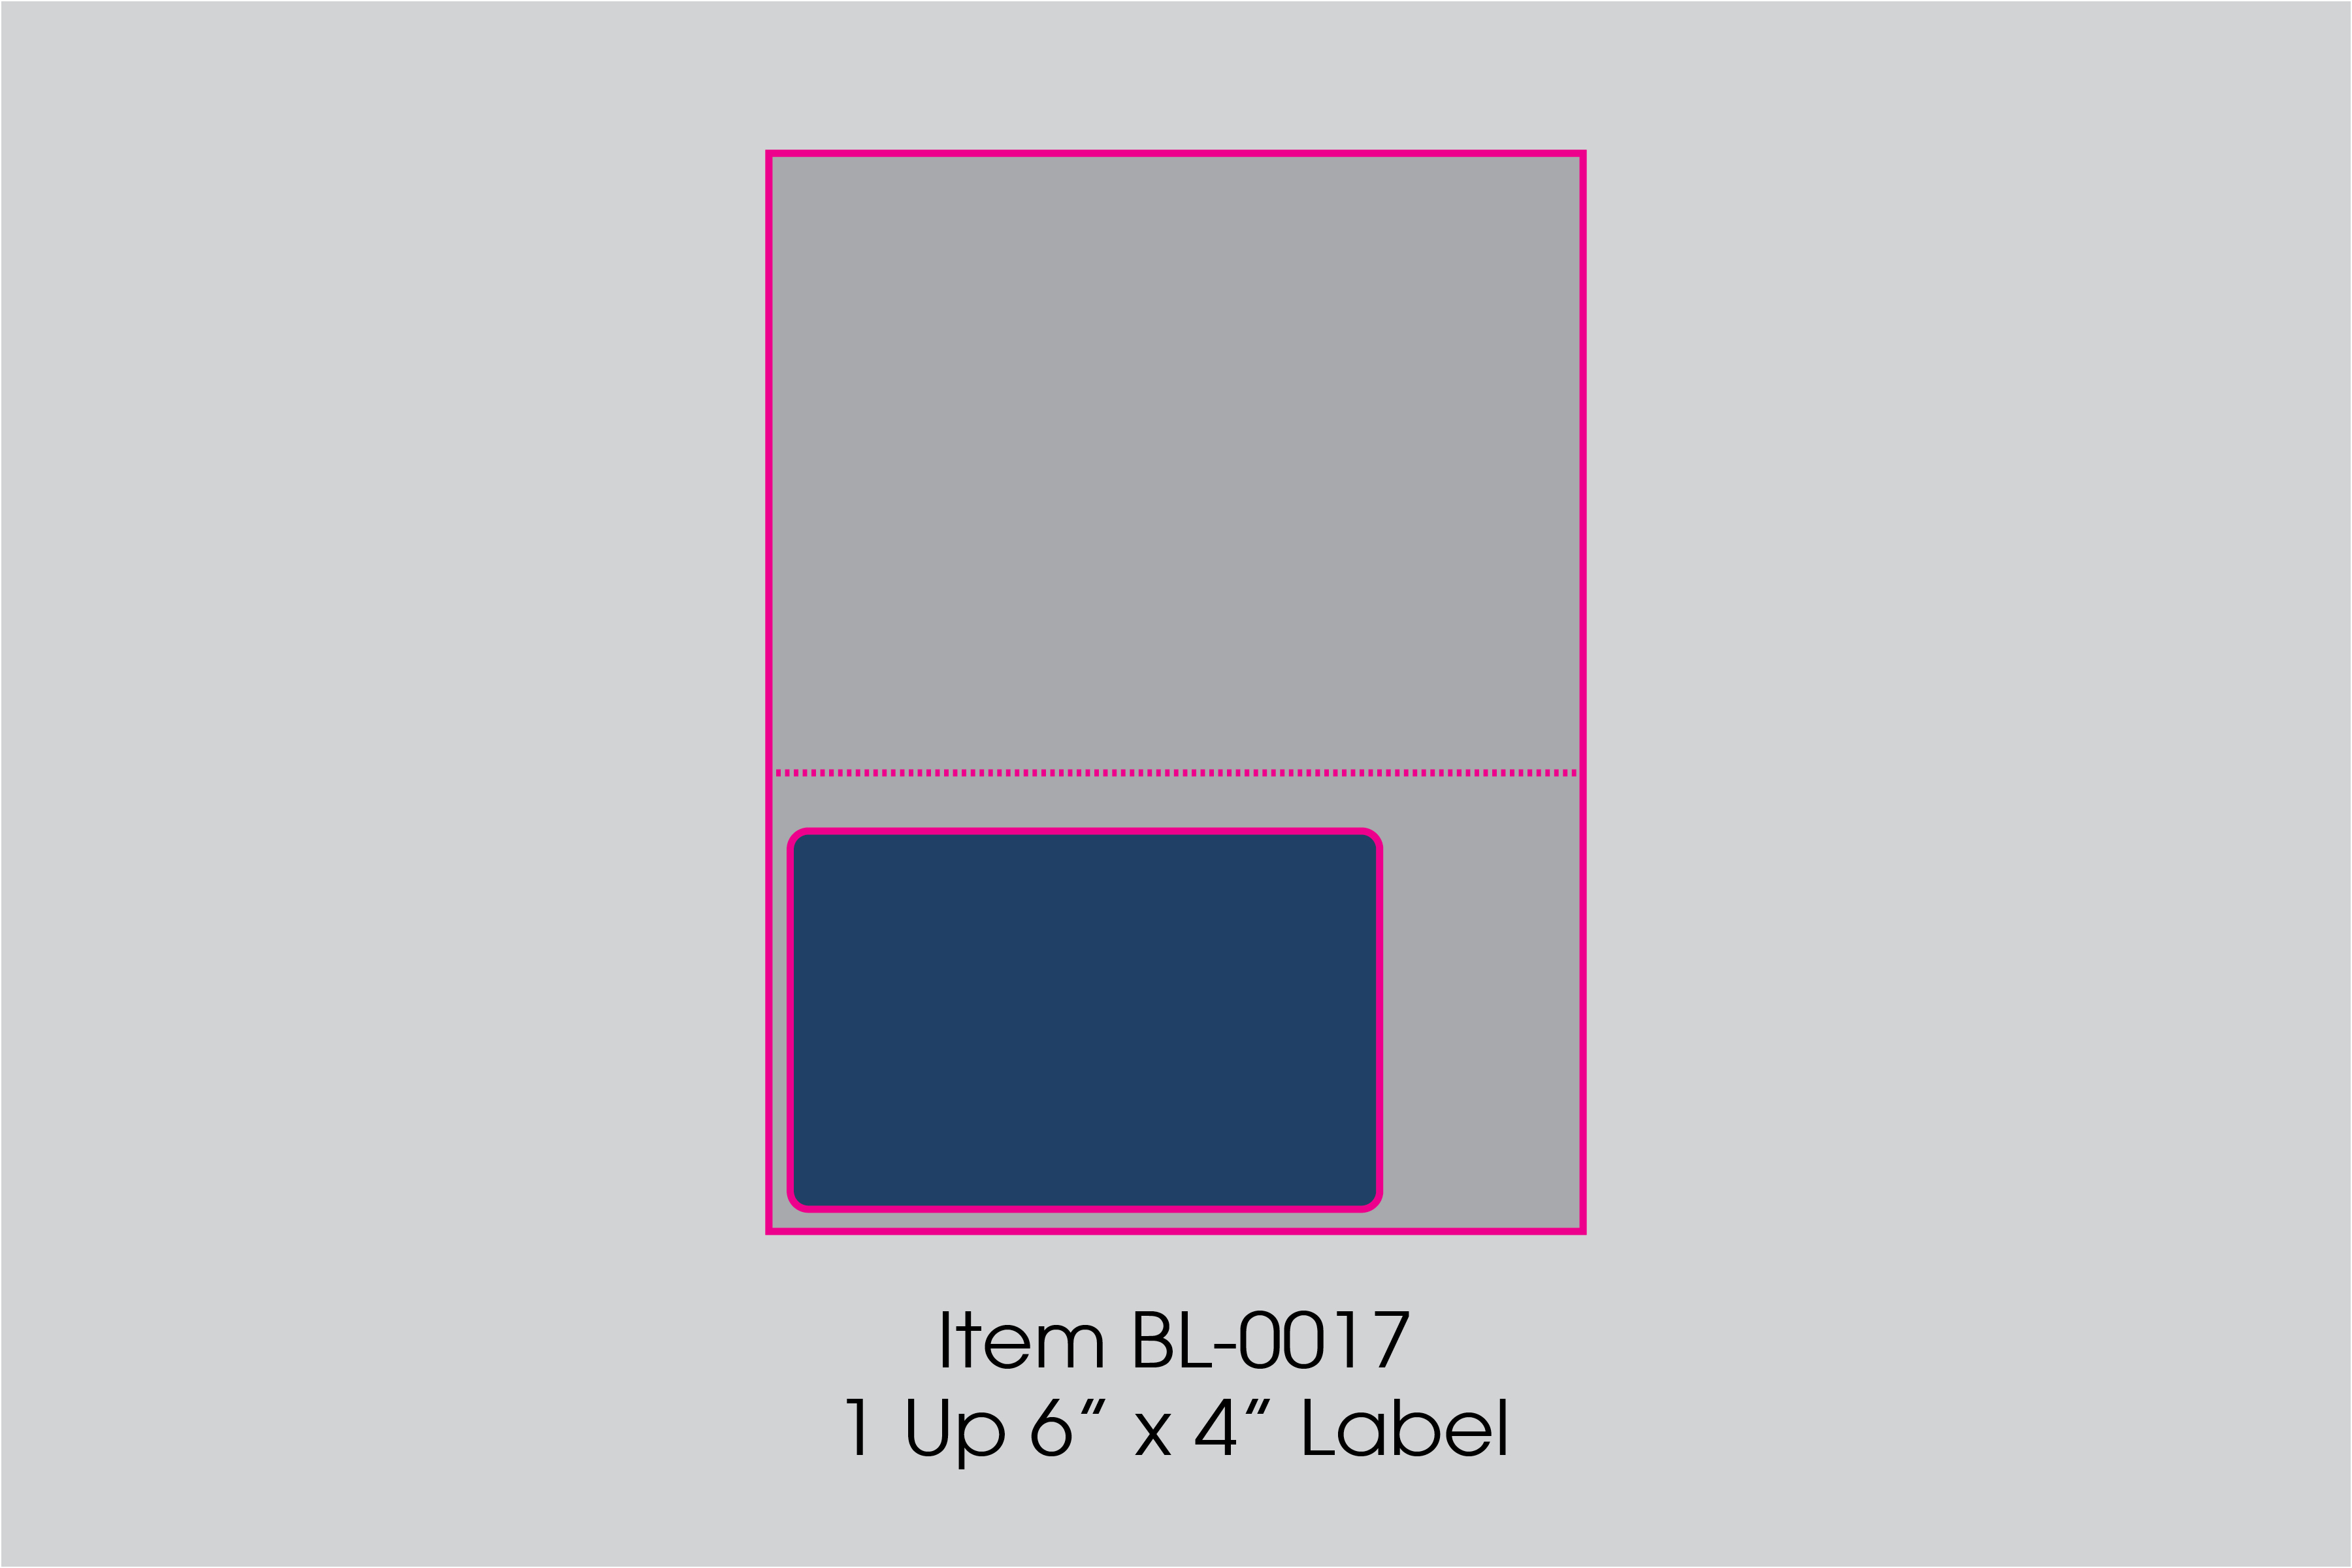 BL-0017